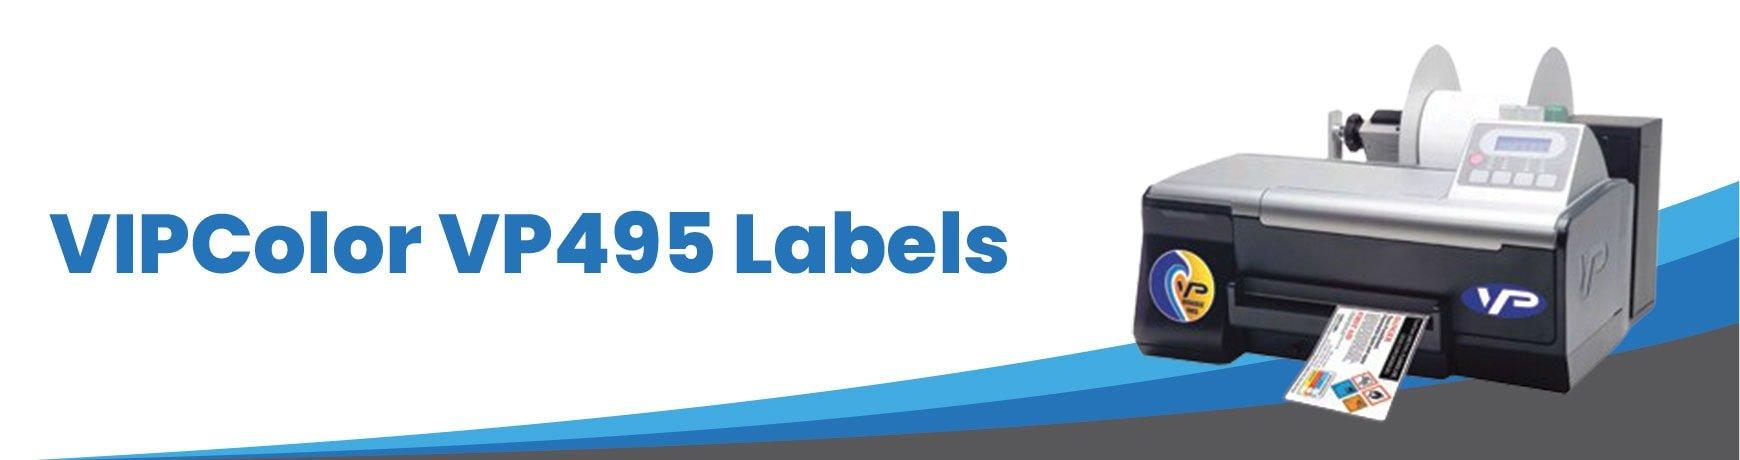 VIPColor VP495 Labels